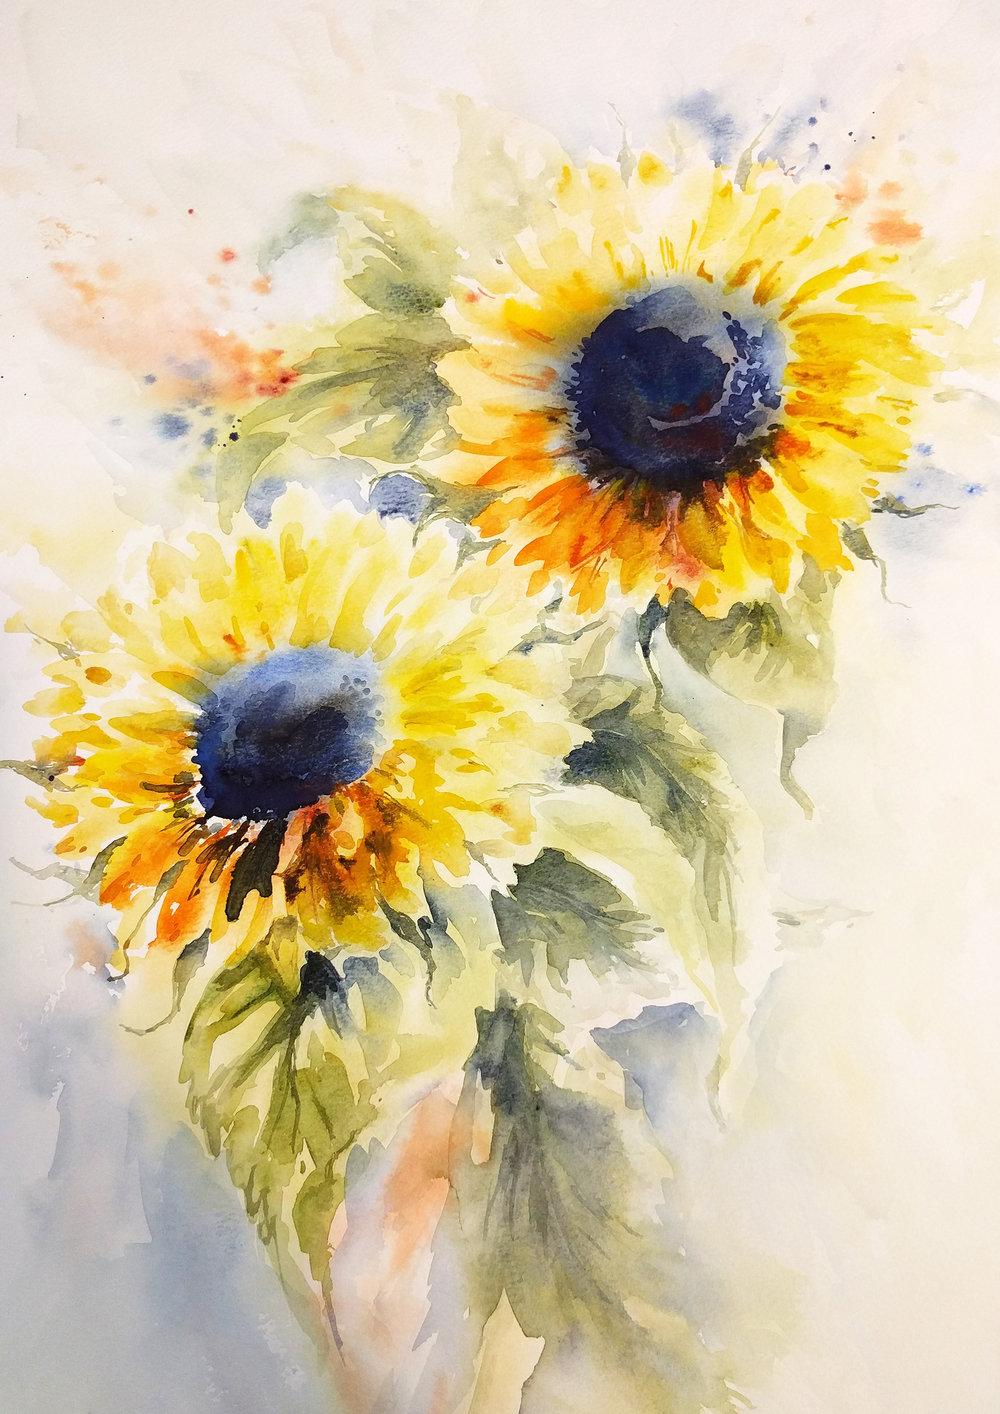 nicky-hunter-watercolour-painting-sunflowers.jpg